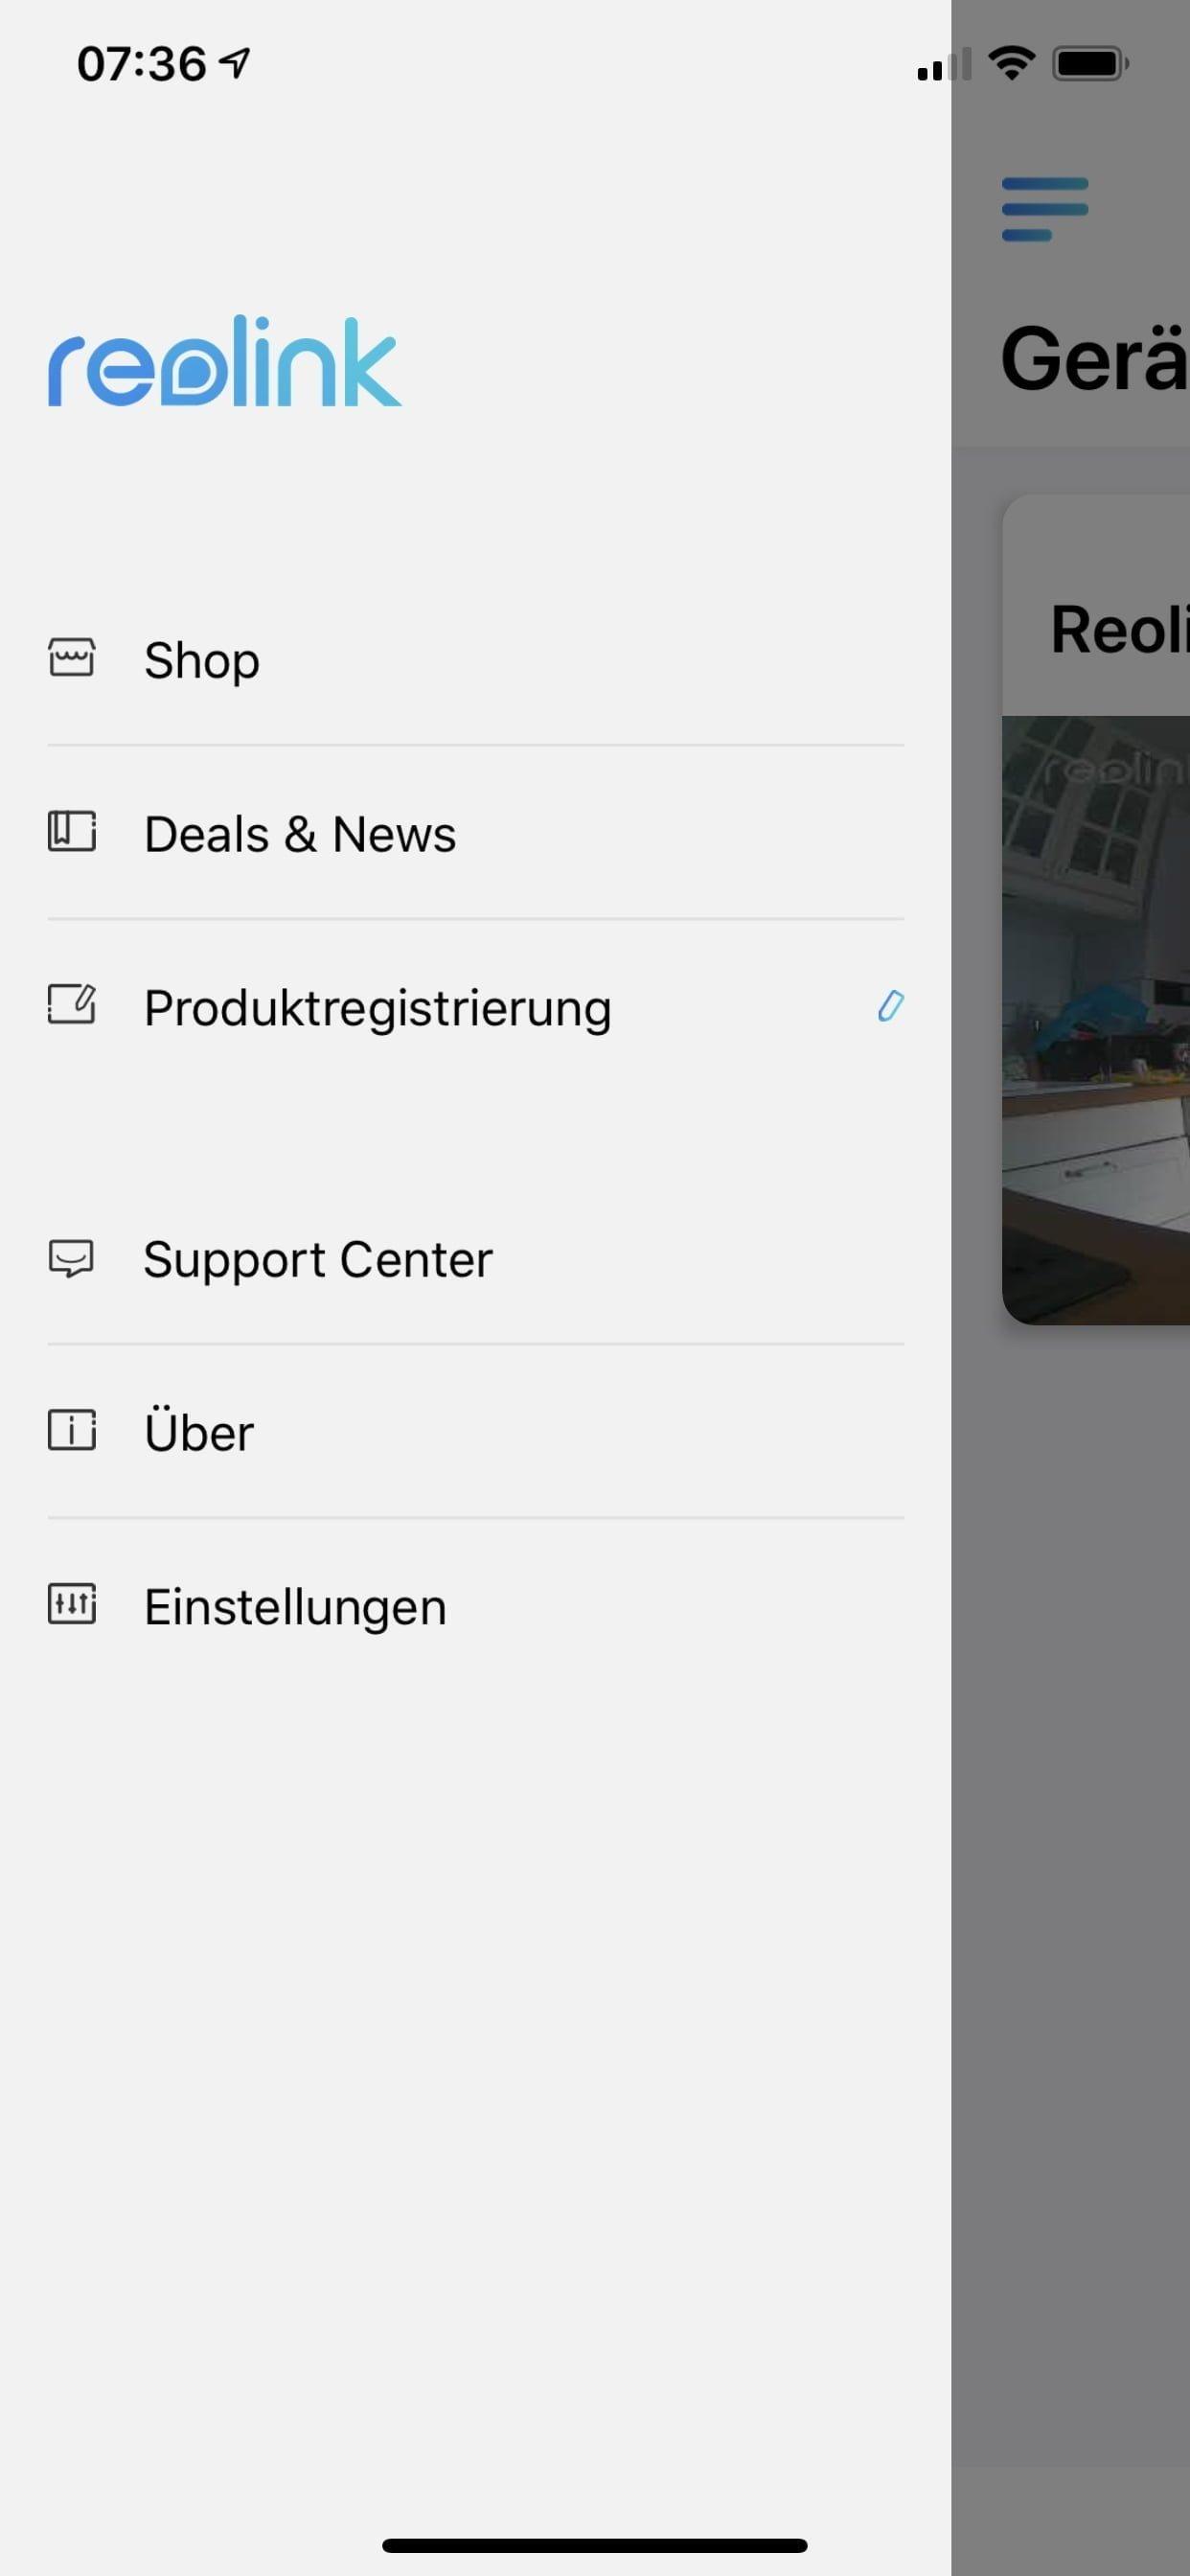 Reolink C2 Pro Test – Innenräume unter Kontrolle? techboys.de • smarte News, auf den Punkt!